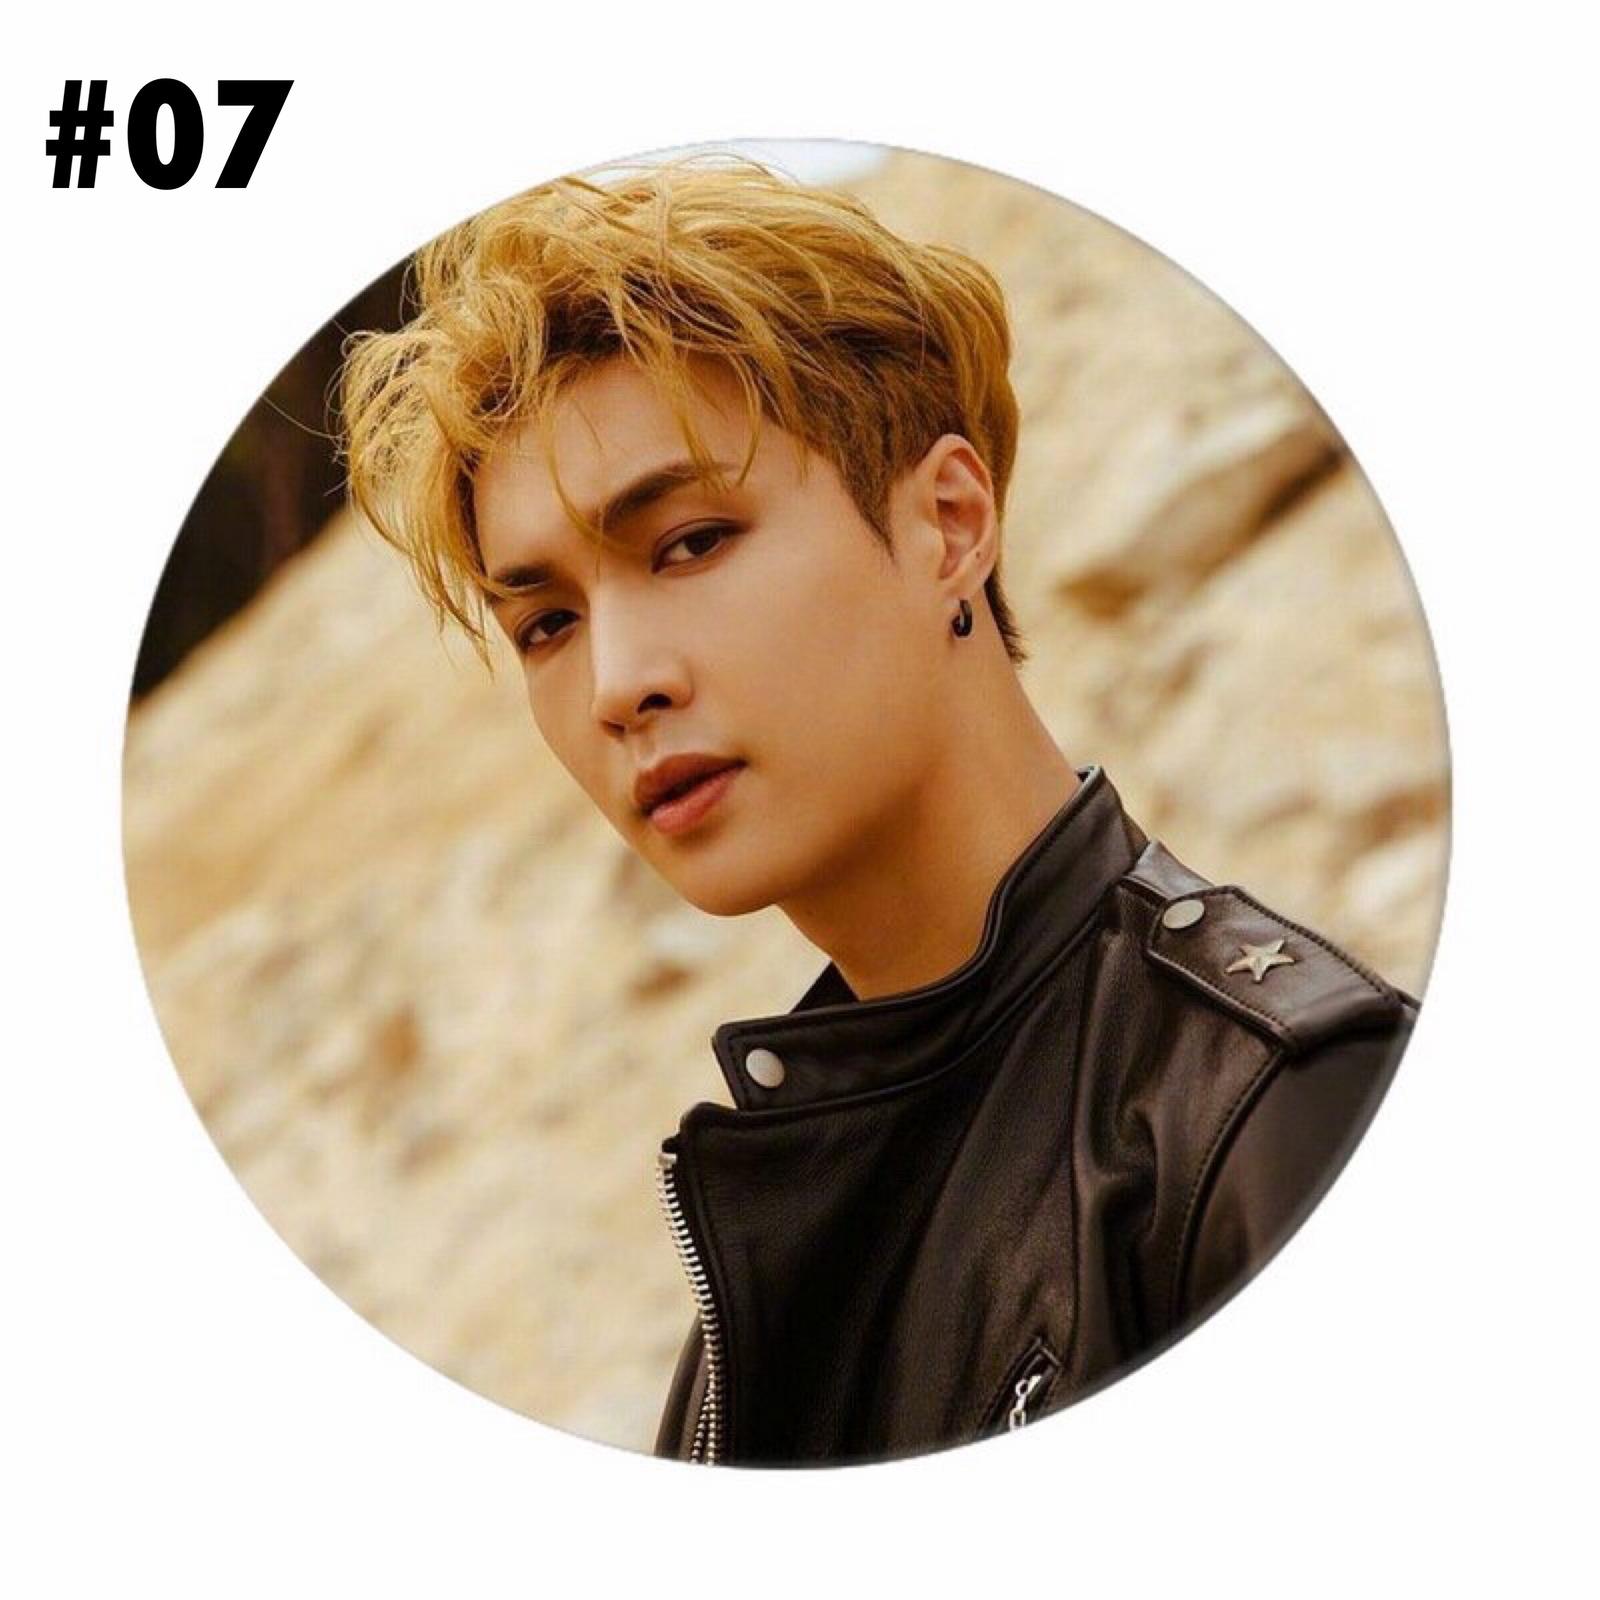 EXO Kpop Chanyeol Baekhyun Badge Brooch Pin Lapel Backpack Jewellery Accessories image 7